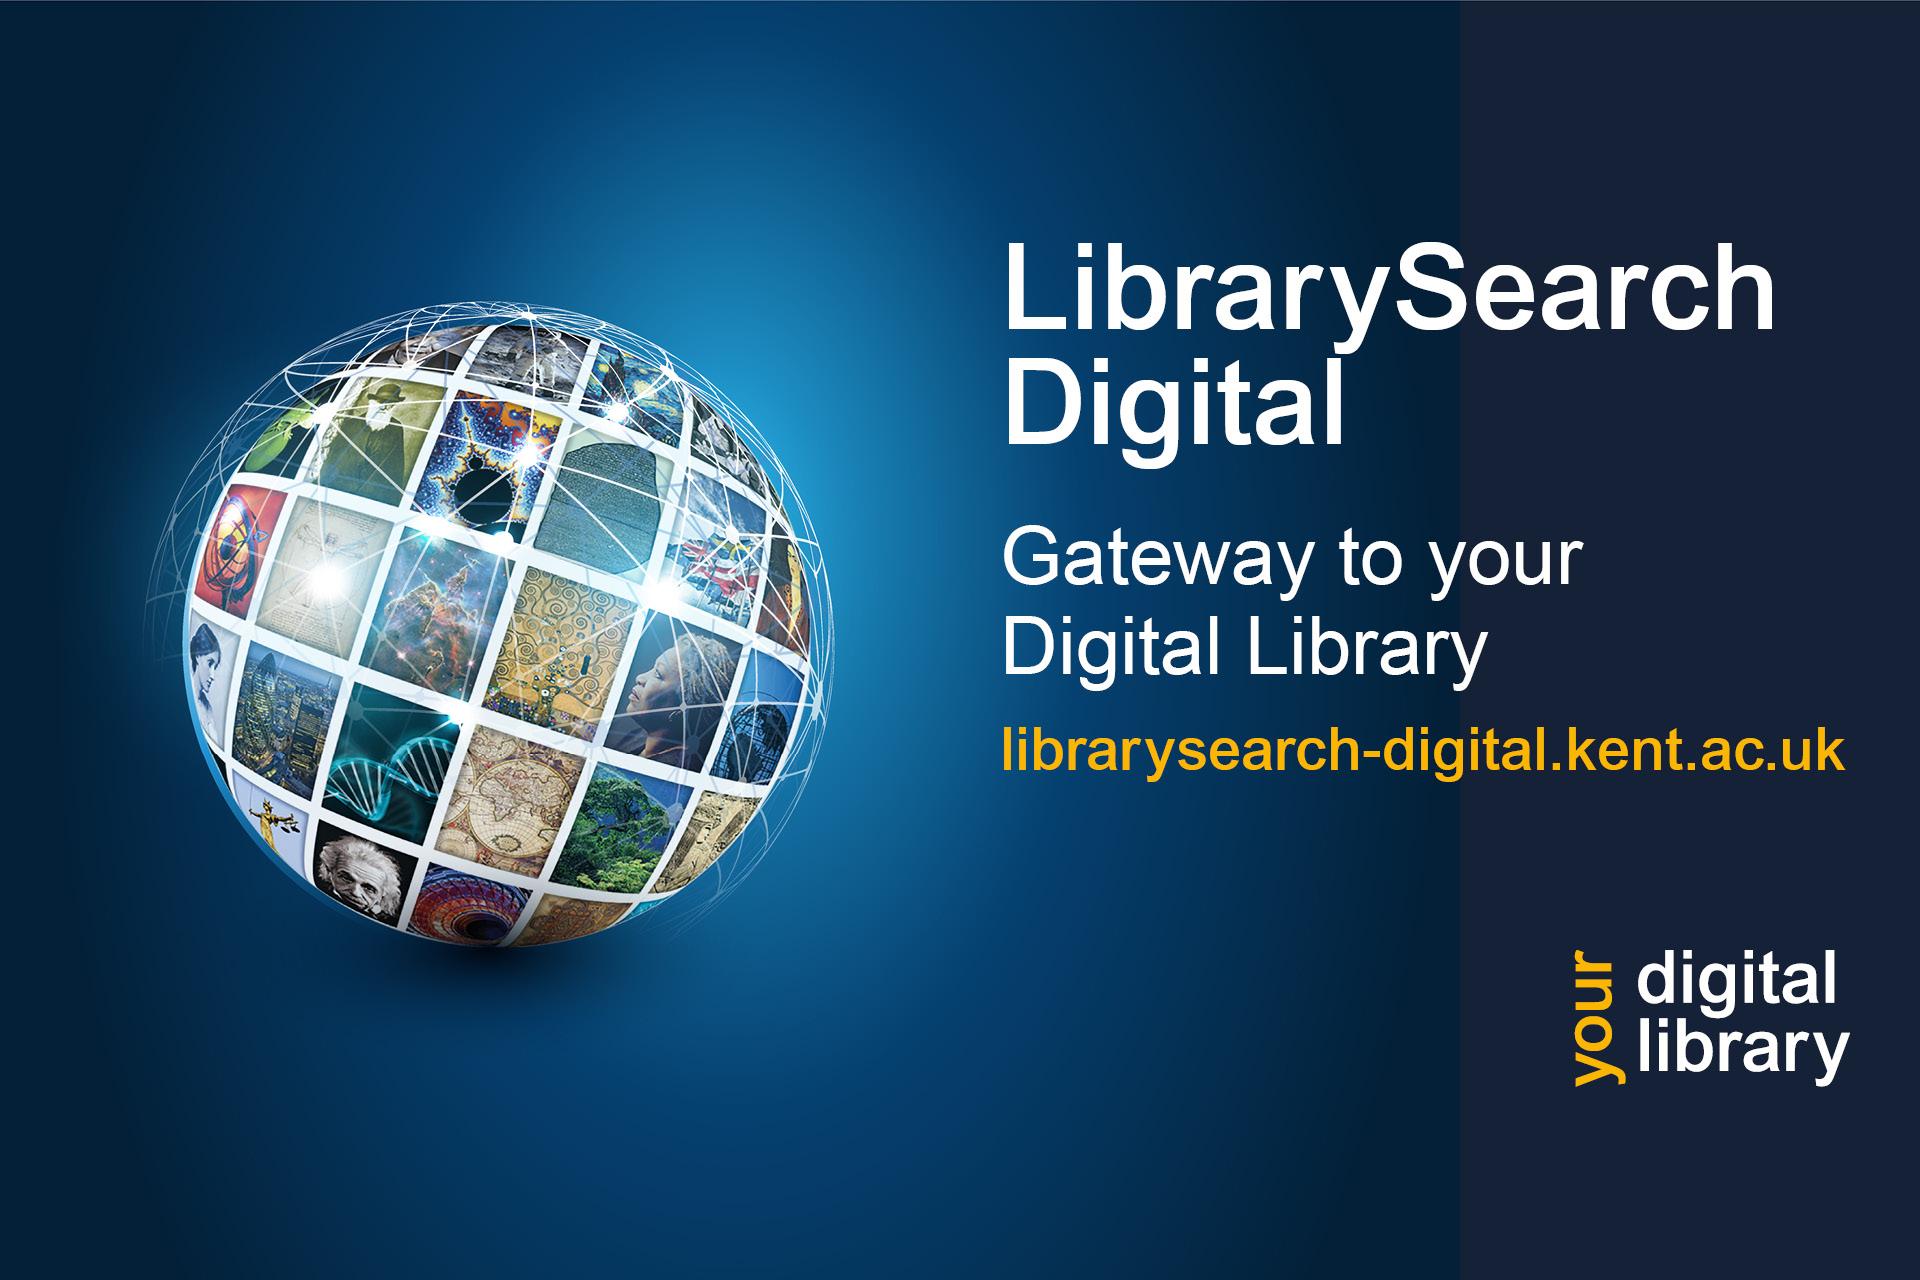 LibrarySearch Digital - your digital library